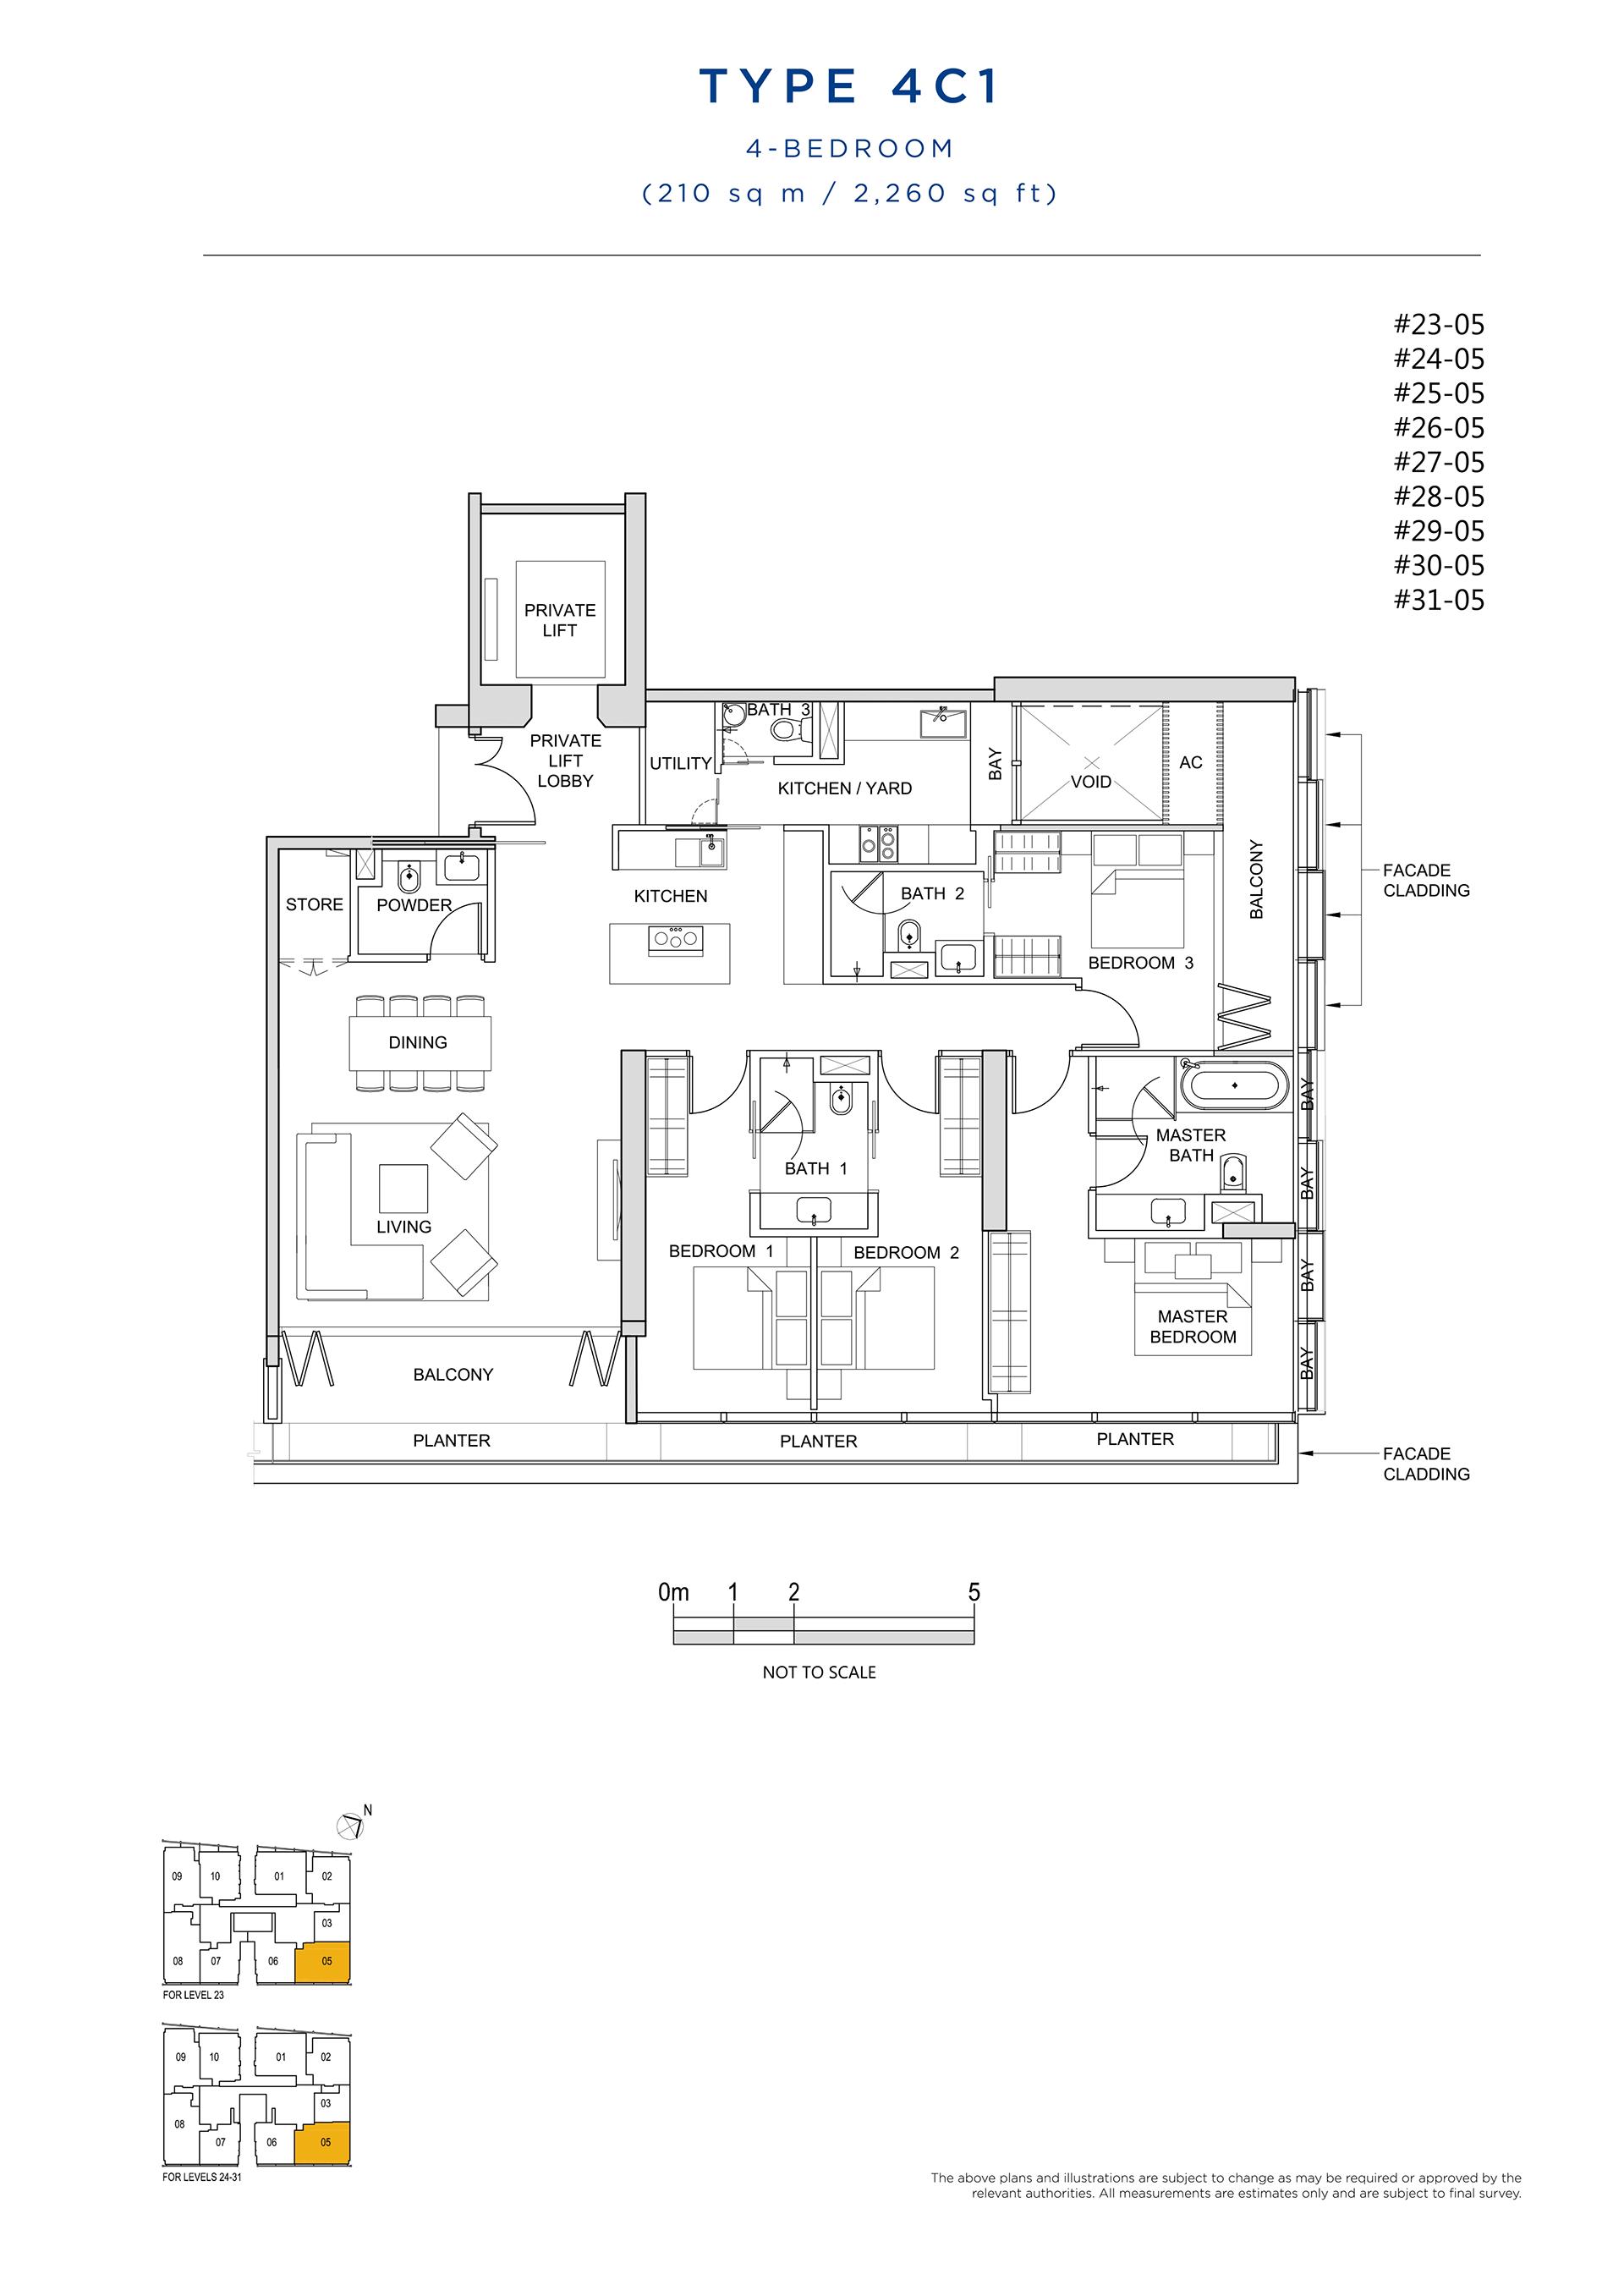 South Beach Residences 4 Bedroom Floor Plan Type 4C1